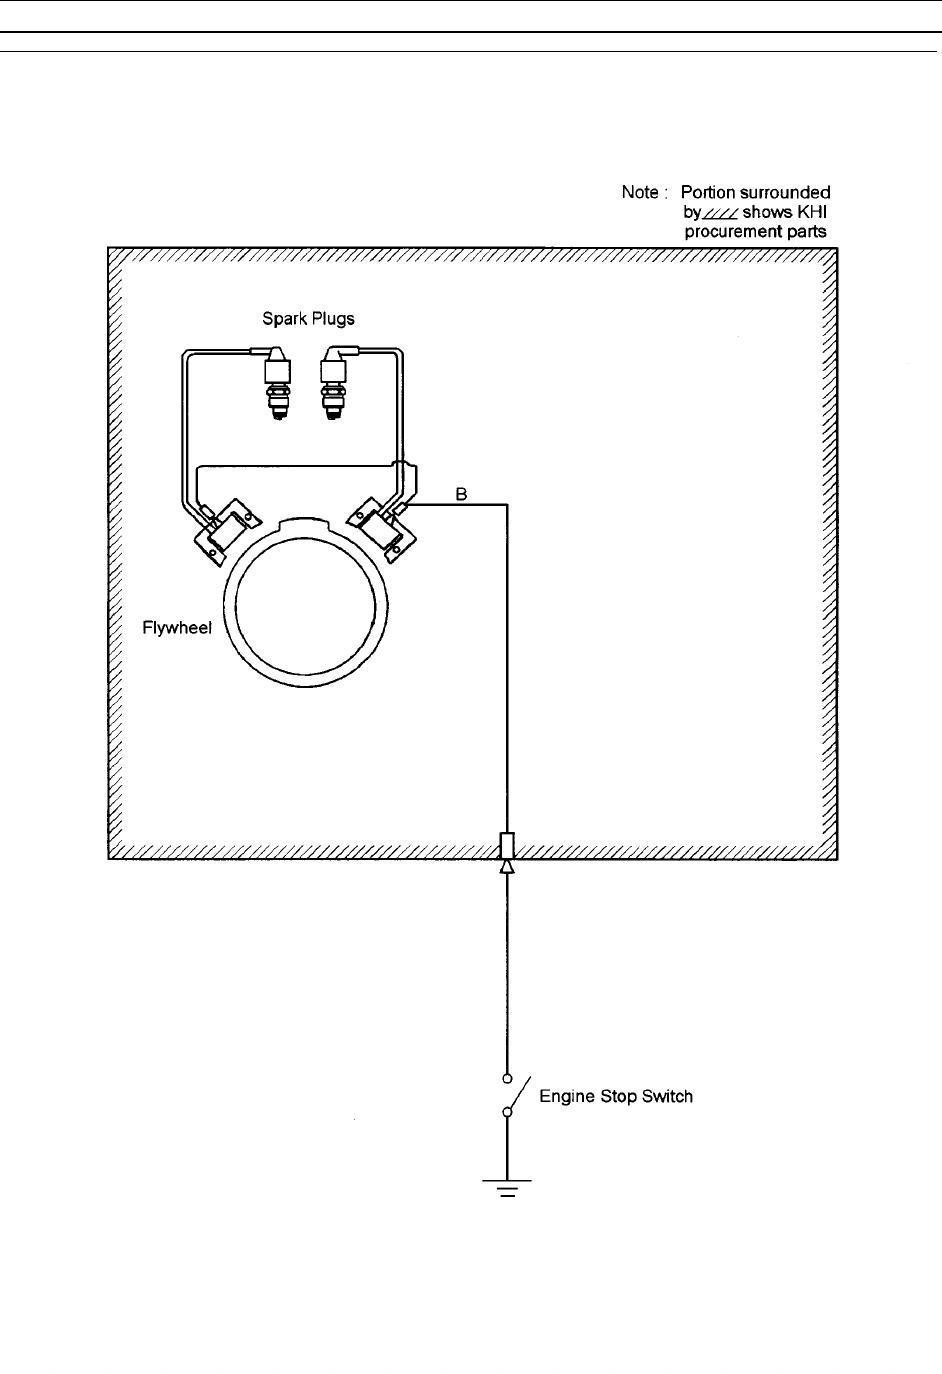 hight resolution of kawasaki fh451v fh500v fh531v fh601v fh641v fh680v fh721v service manual page 117